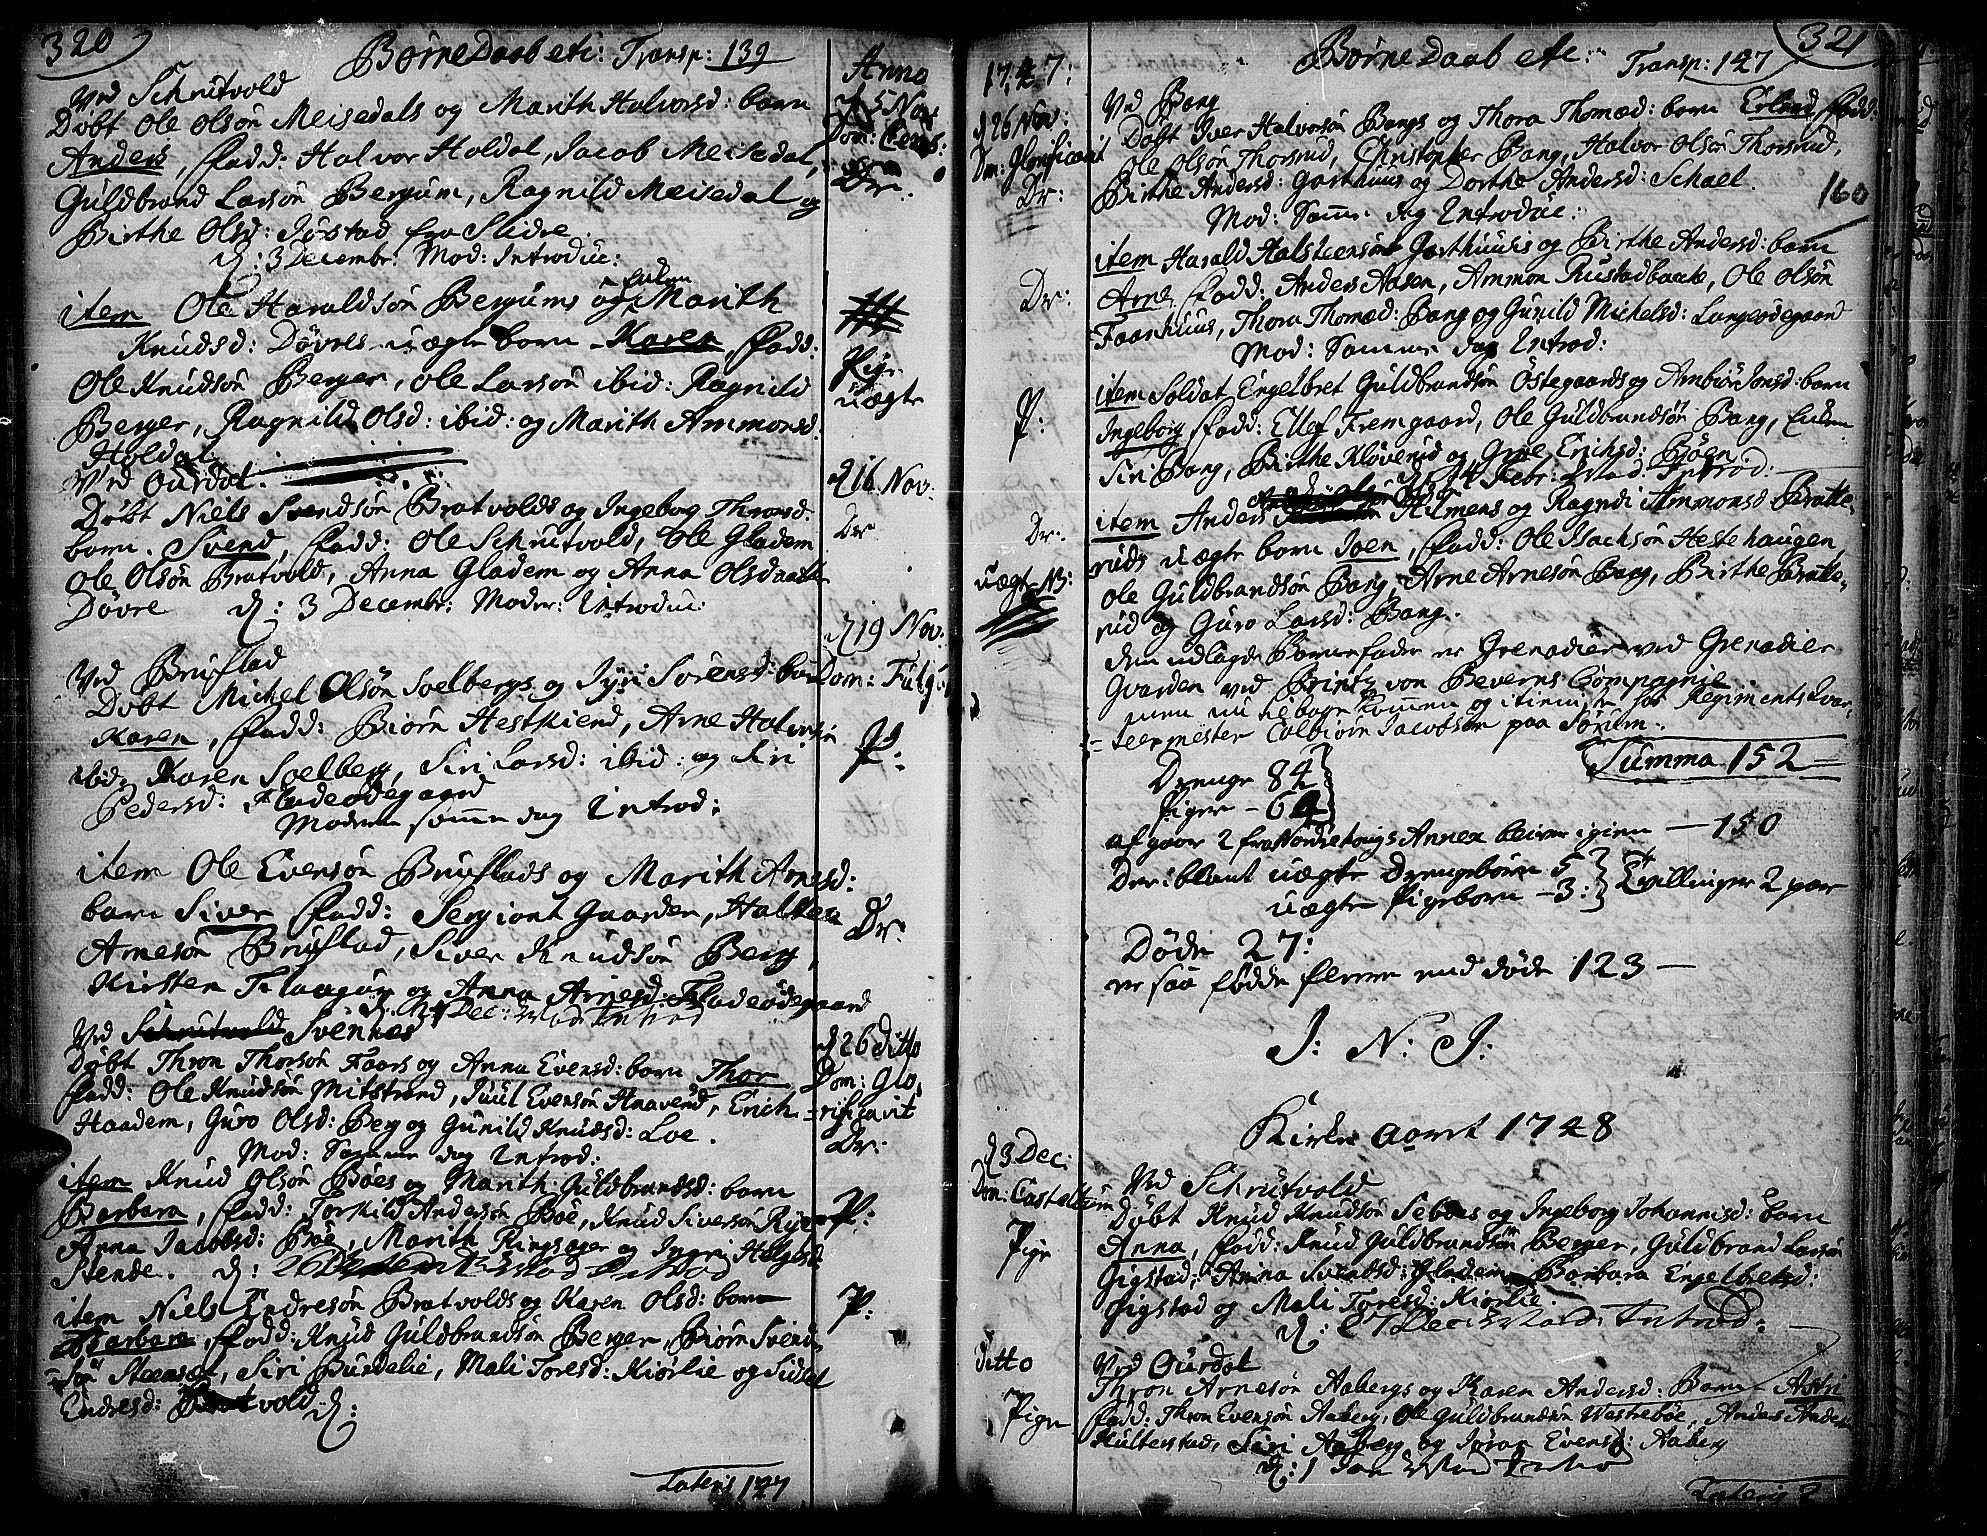 SAH, Aurdal prestekontor, Ministerialbok nr. 4, 1730-1762, s. 320-321